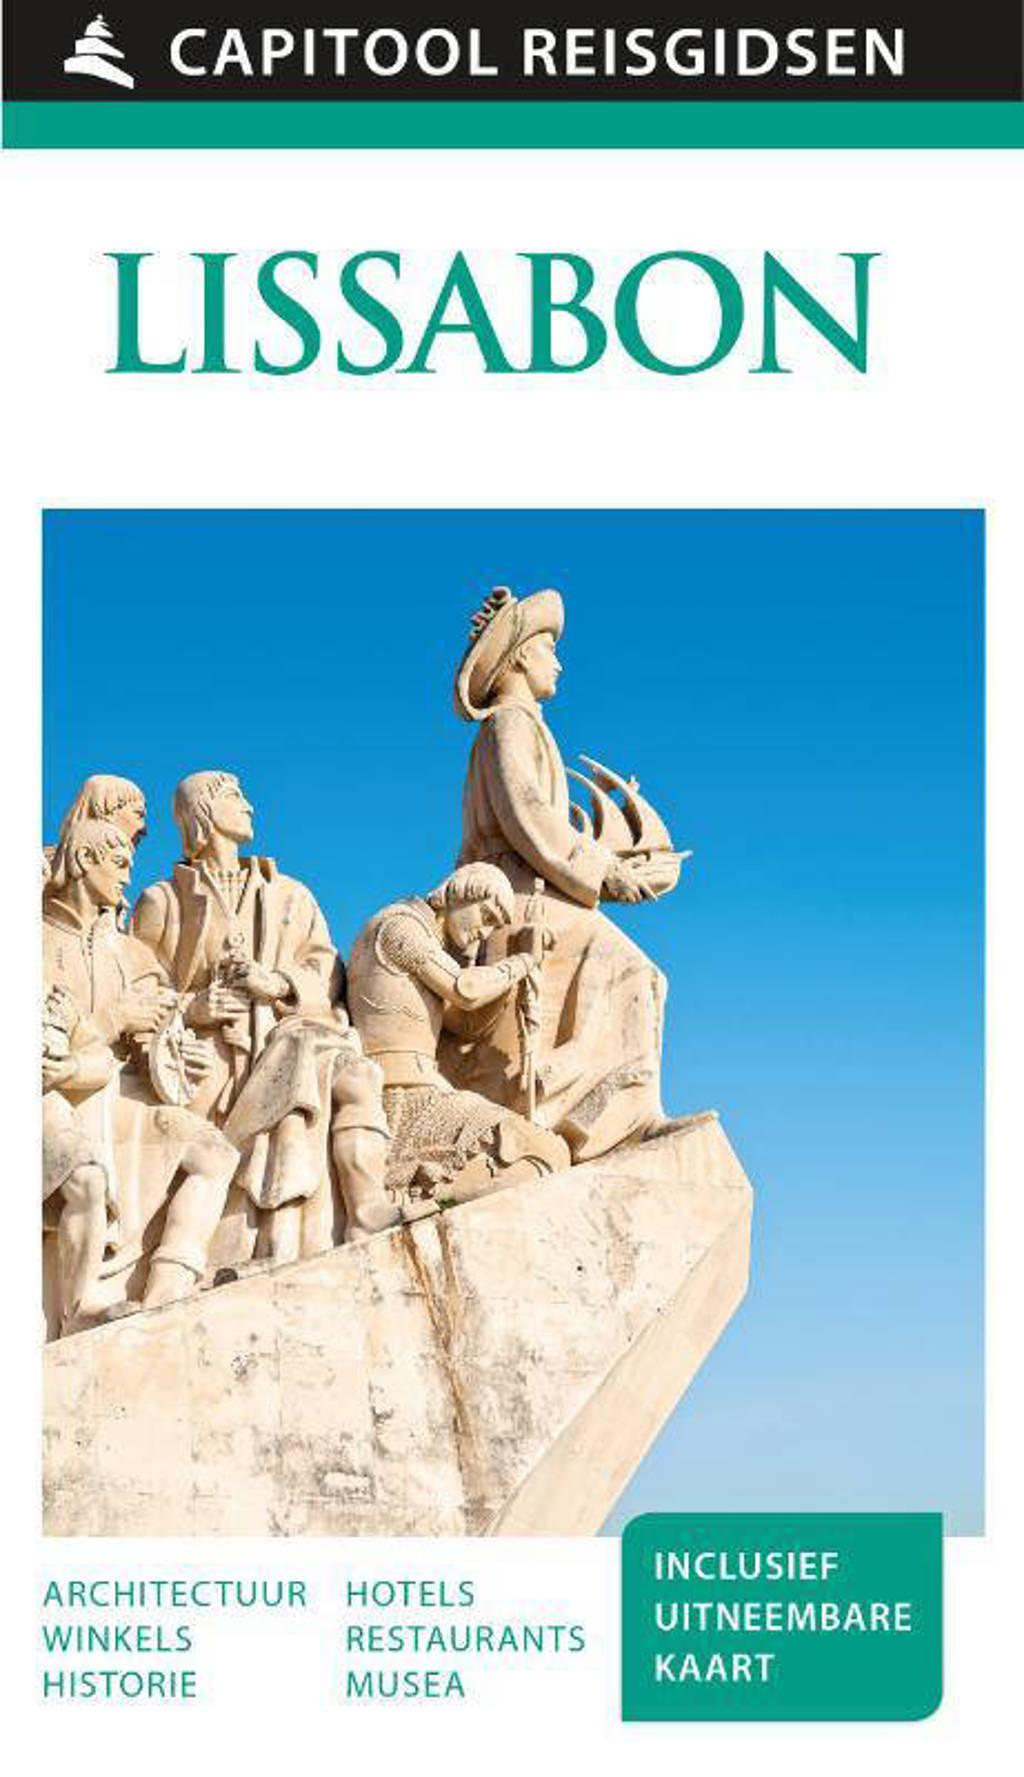 Capitool reisgidsen: Lissabon - Susie Boulton en Clive Gilbert